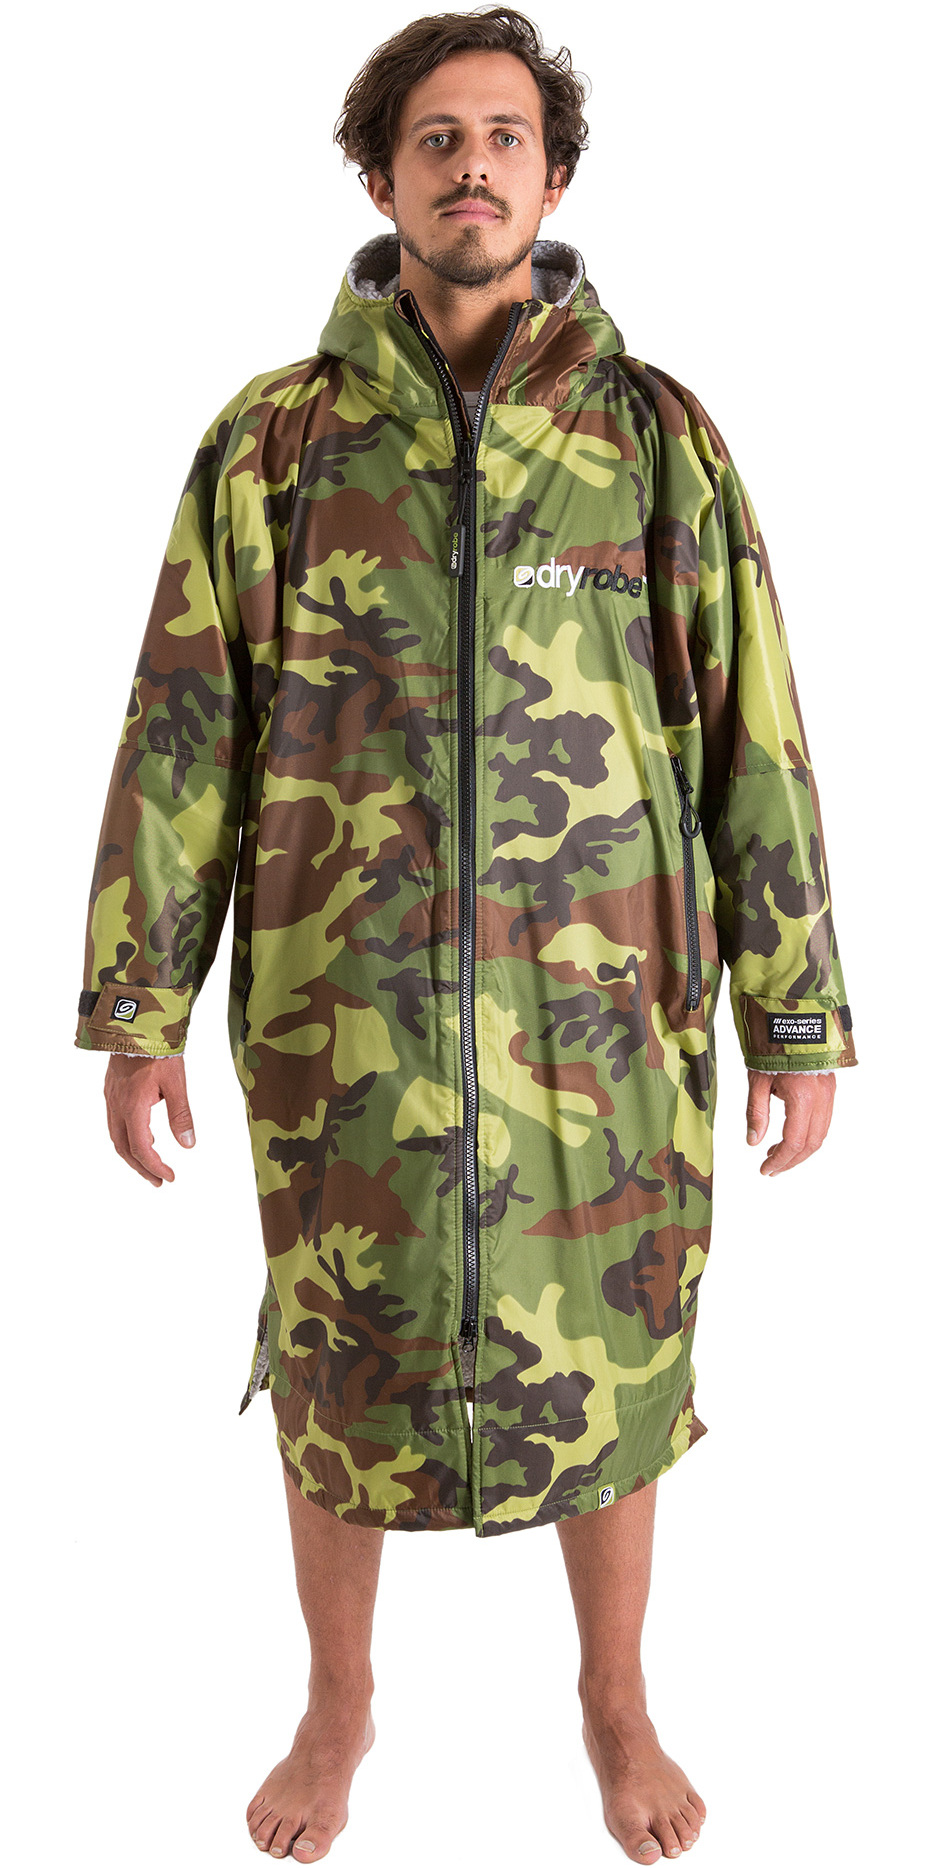 f0c32c1677 2019 Dryrobe Advance Long Sleeve Premium Outdoor Change Robe Dr104 Camo  Grey - Dr104 - Change Robes